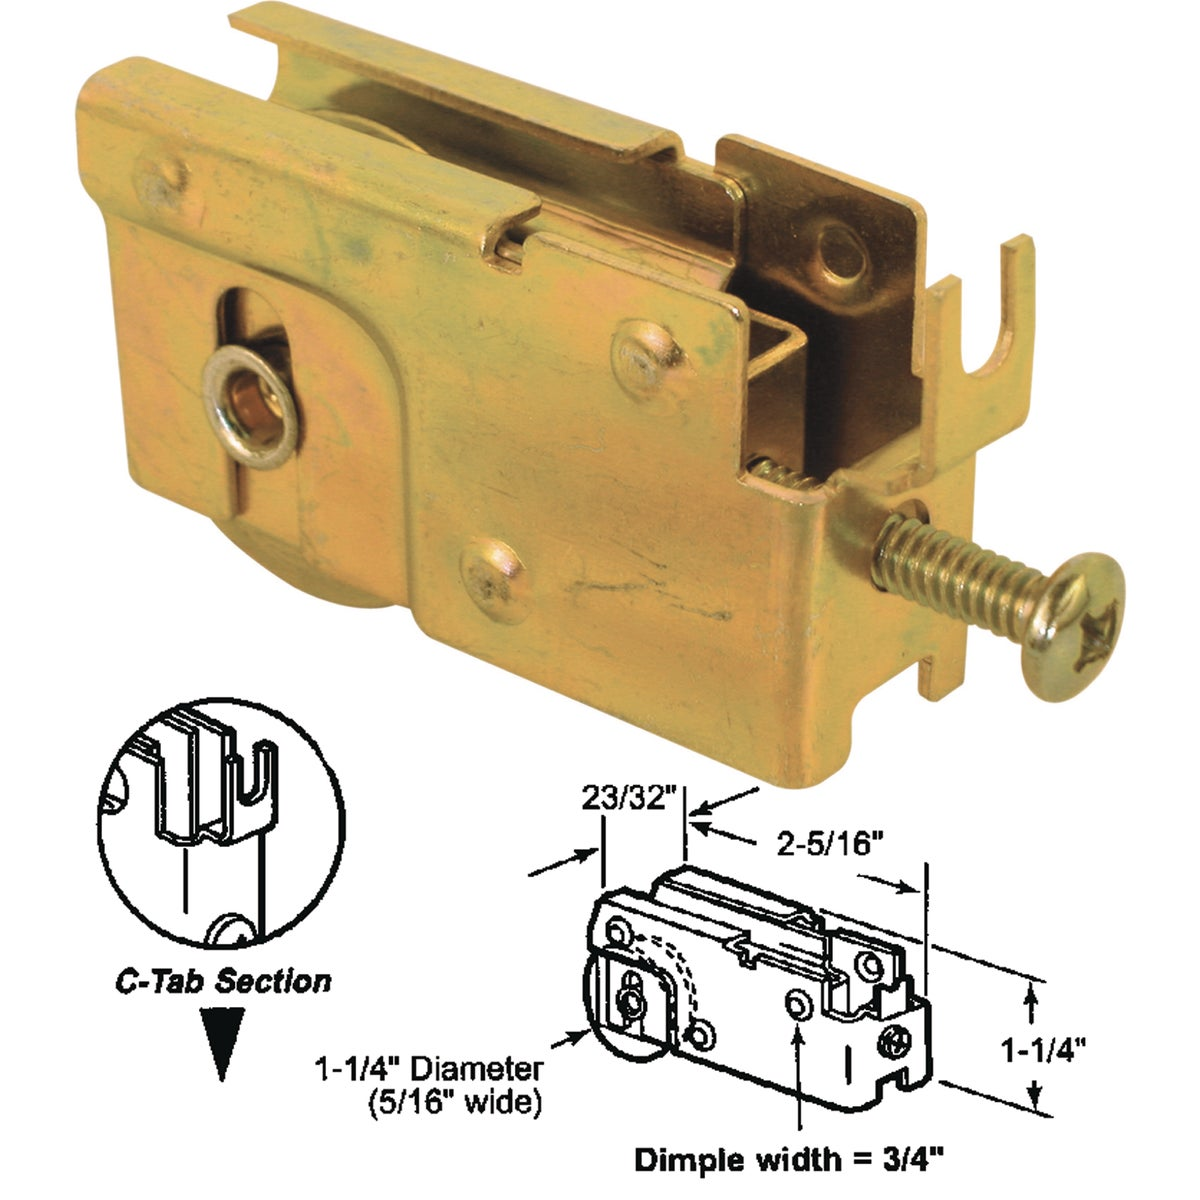 SLIDING GLS DOOR ROLLER - 131846 by Prime Line Products